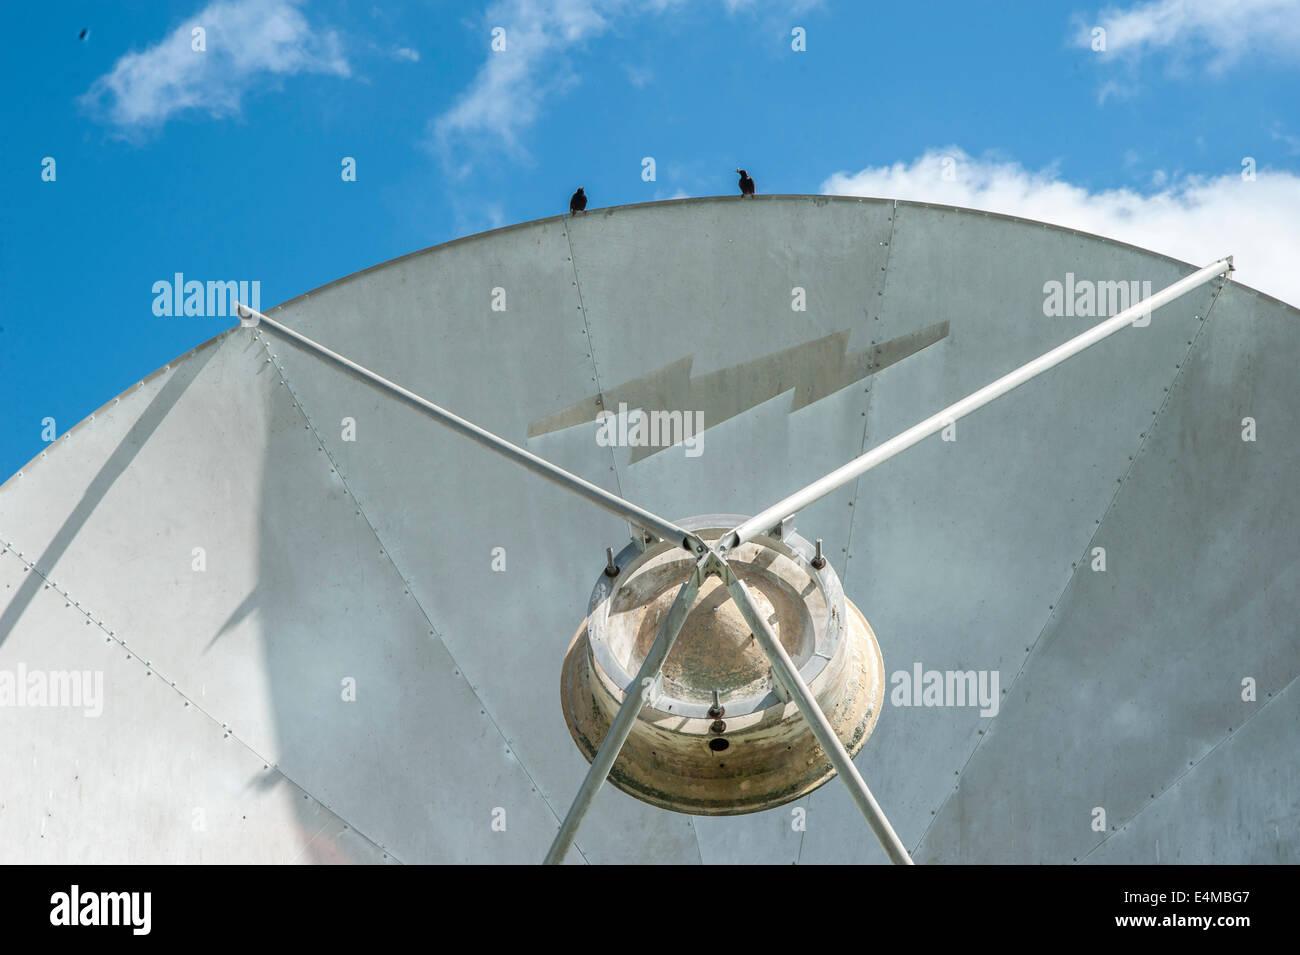 Vögel auf Empfänger Satellitenschüssel Stockbild